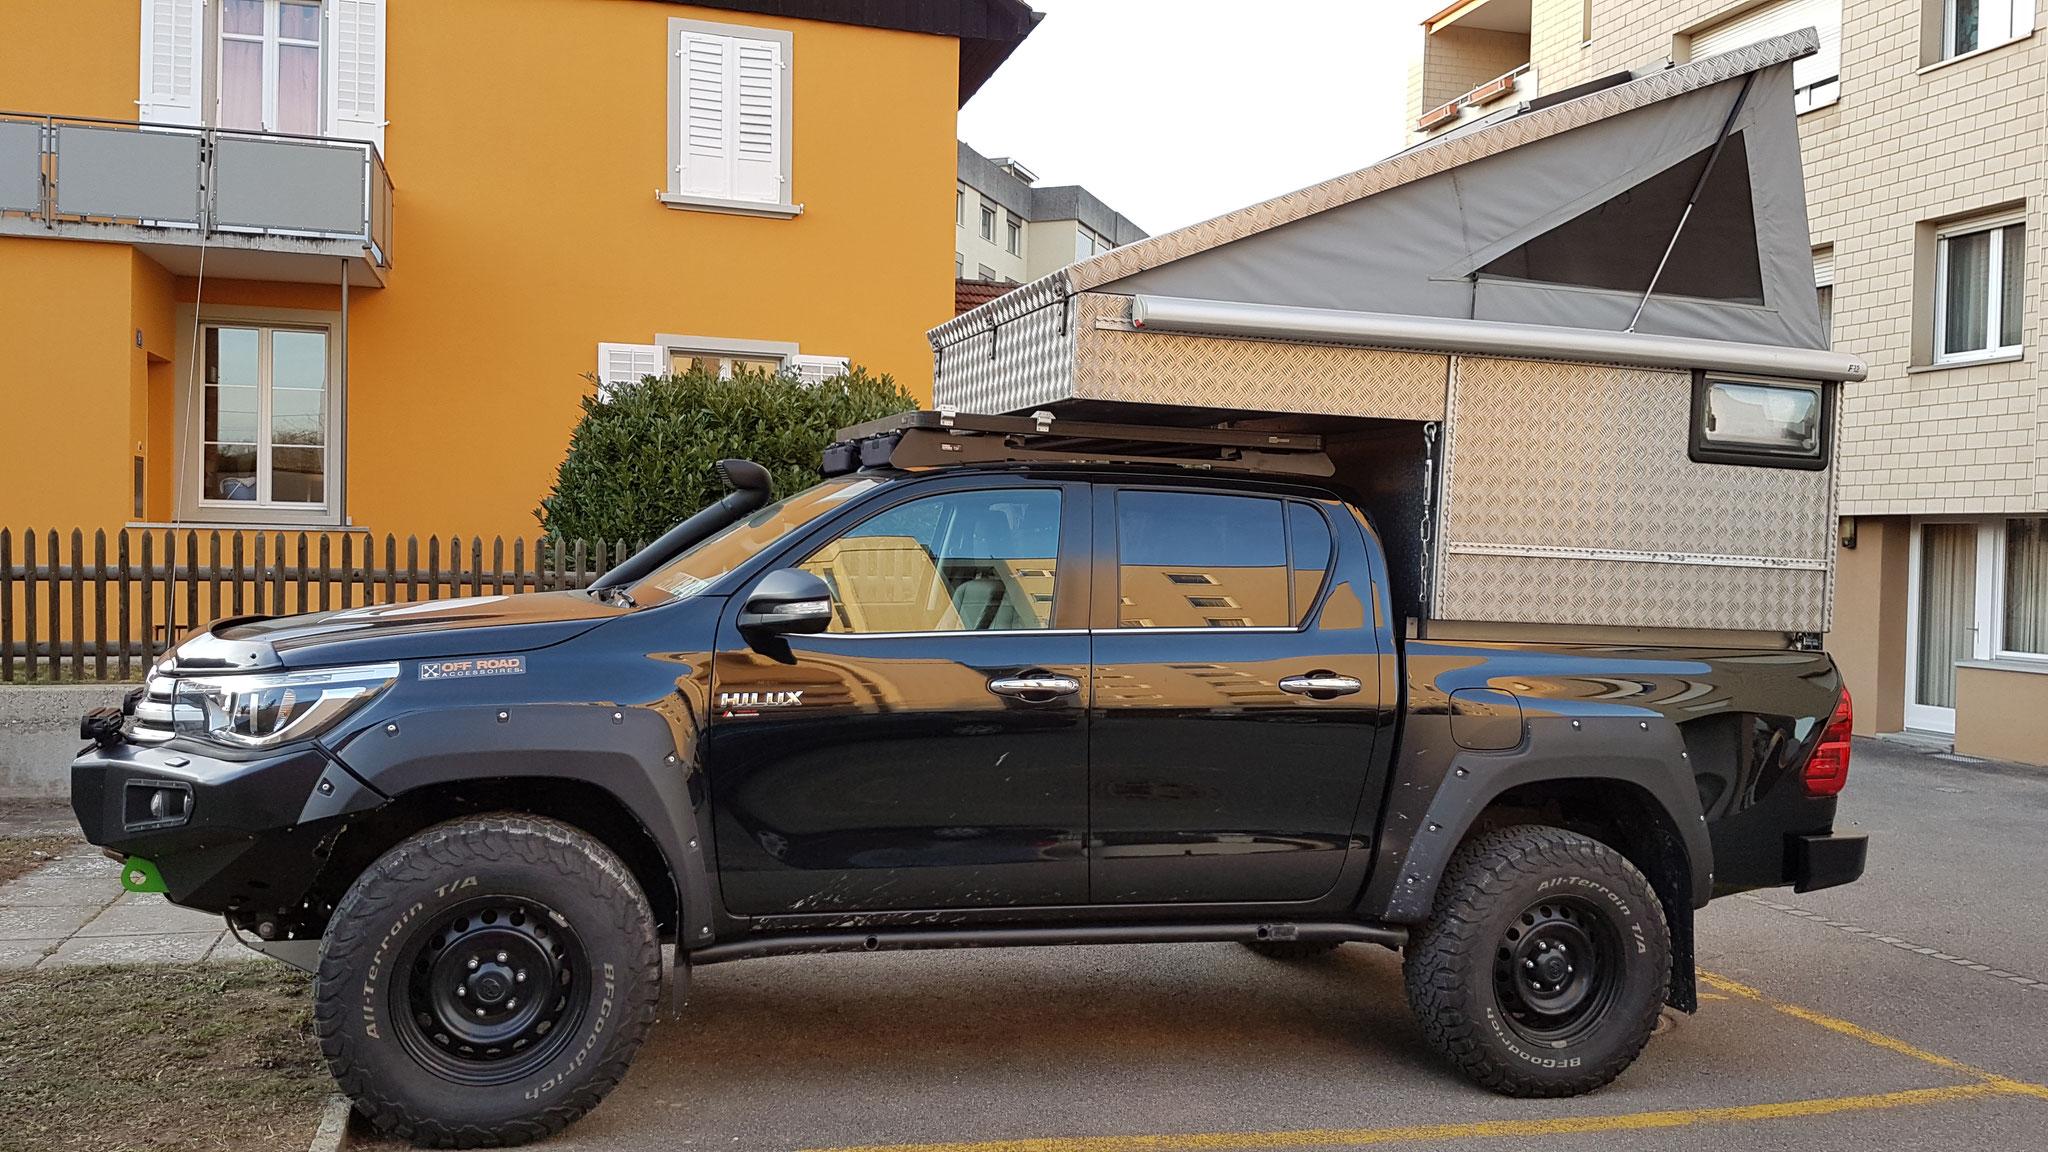 "Exkab 1 Wohnkabine Toyota Hilux Pickup camper Revo 2017 2.4 #ProjektBlackwolf truckcamper  4x4 ARB Fahrwerk Frontrunner Rocksliders Roofrack Rival skidplate  bfgoodrich 285/70R17 33"" Tires TJM Sknorkel offroad Tacoma expedition overland wolf78-overland.ch"